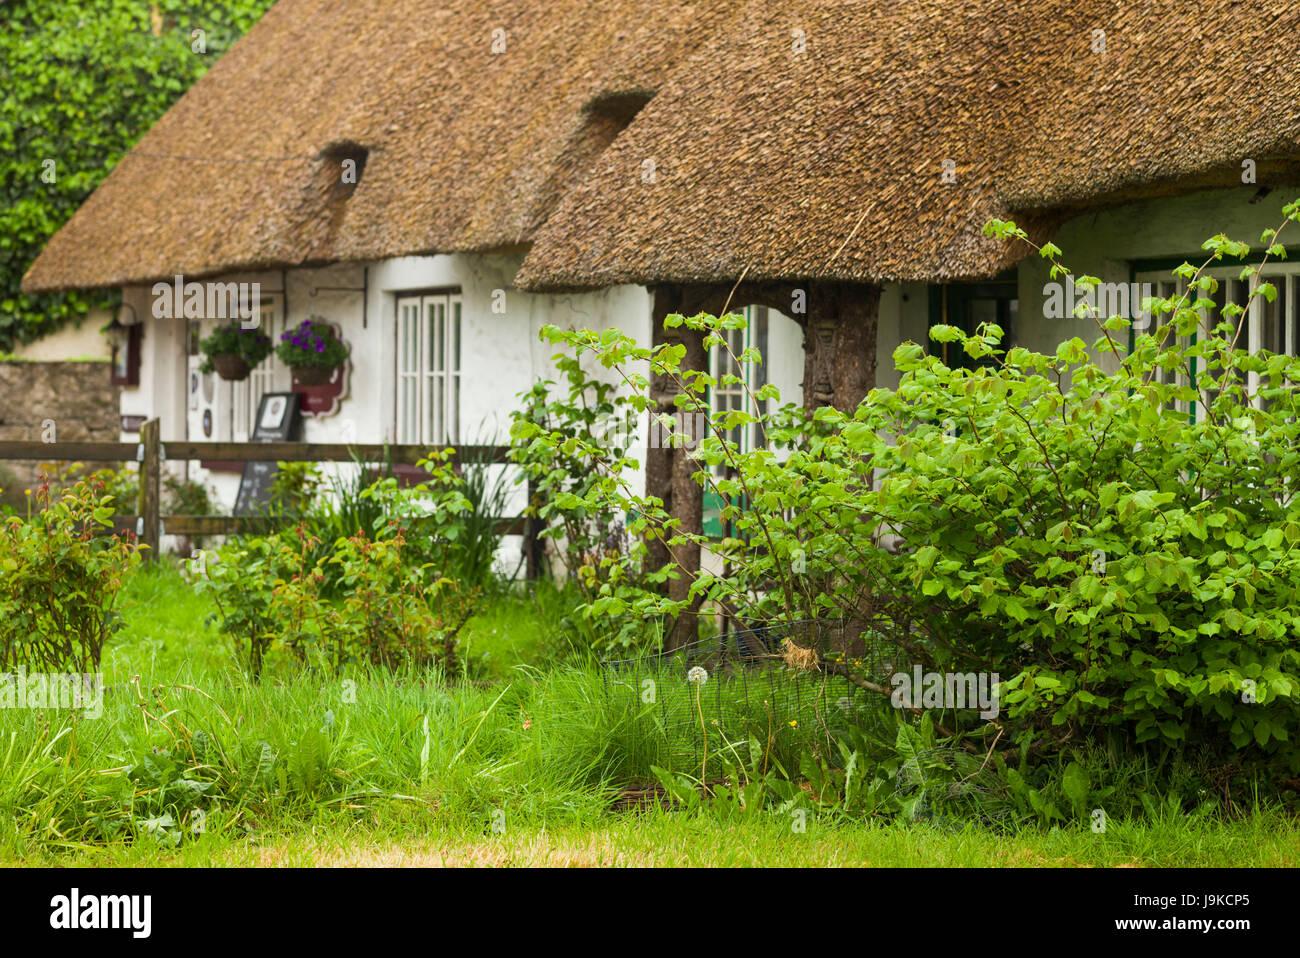 Ireland, County Limerick, Adare, Ireland's Prettiest Village, cottage details - Stock Image